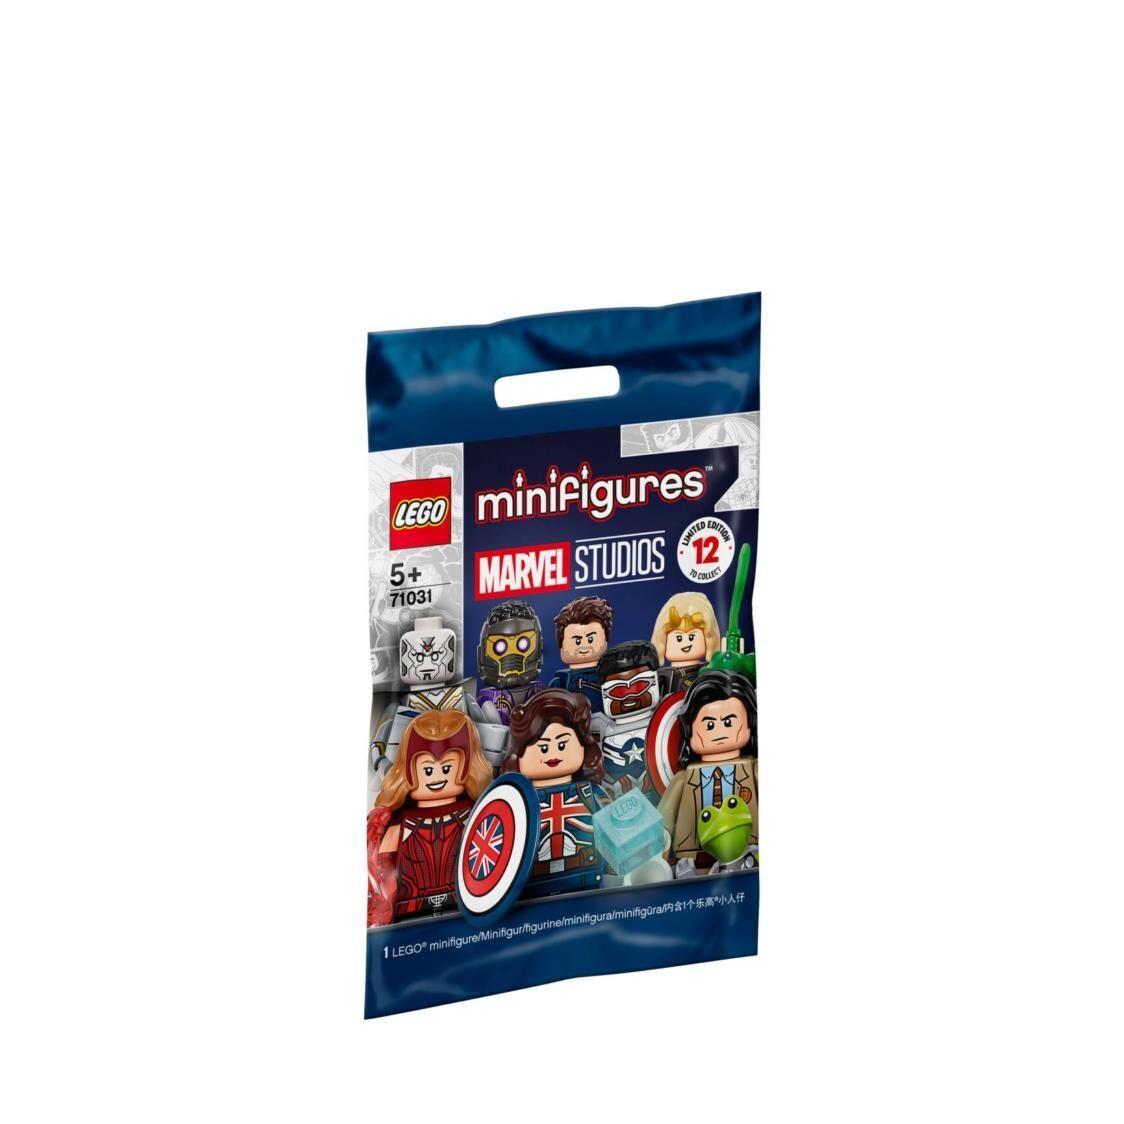 LEGO Marvel Studios 71031